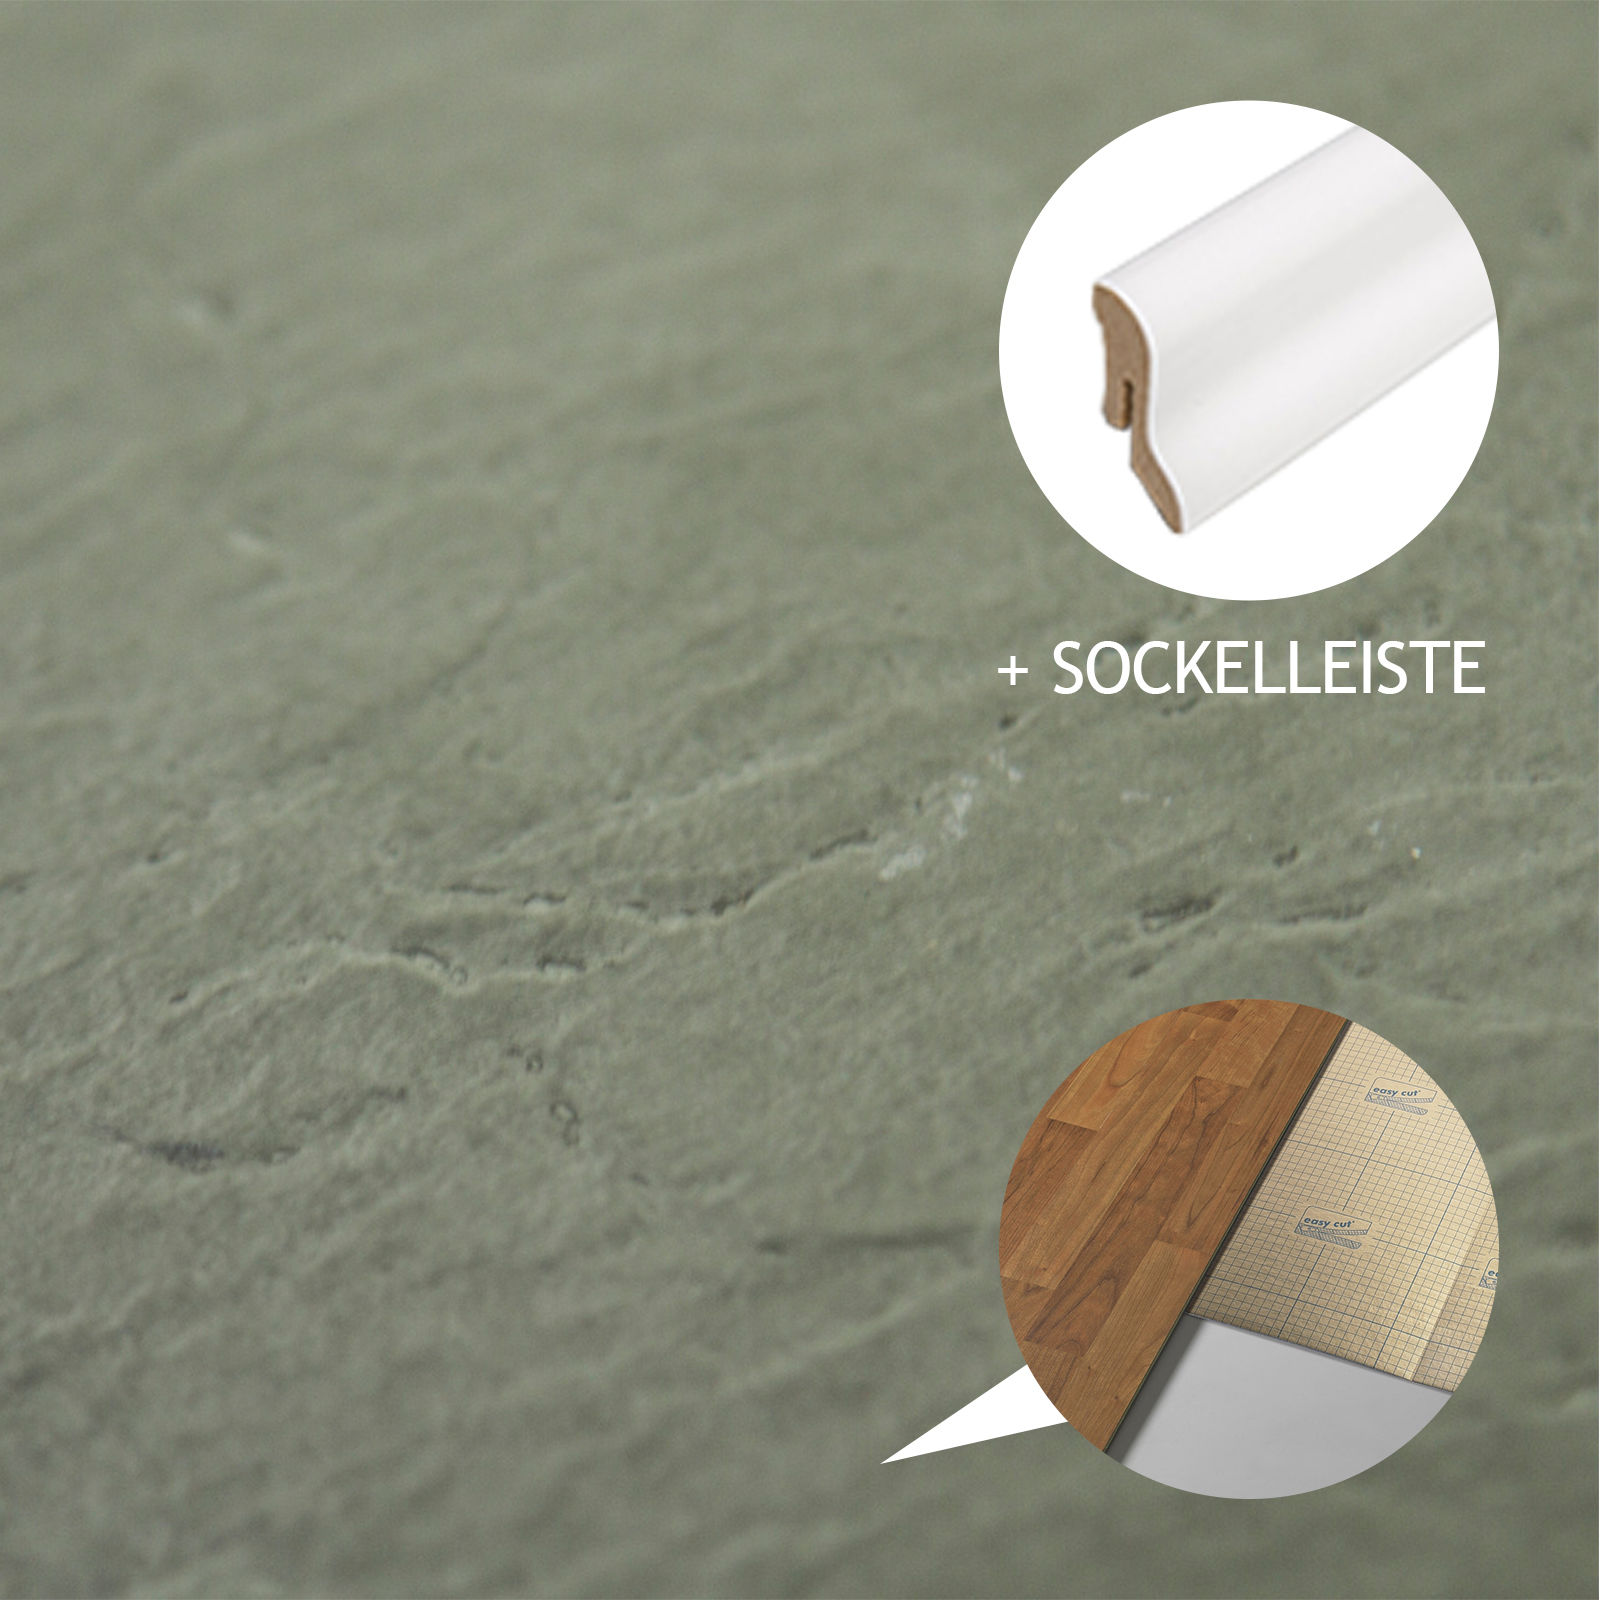 klick pvc awesome with klick pvc simple innovativ pvc. Black Bedroom Furniture Sets. Home Design Ideas